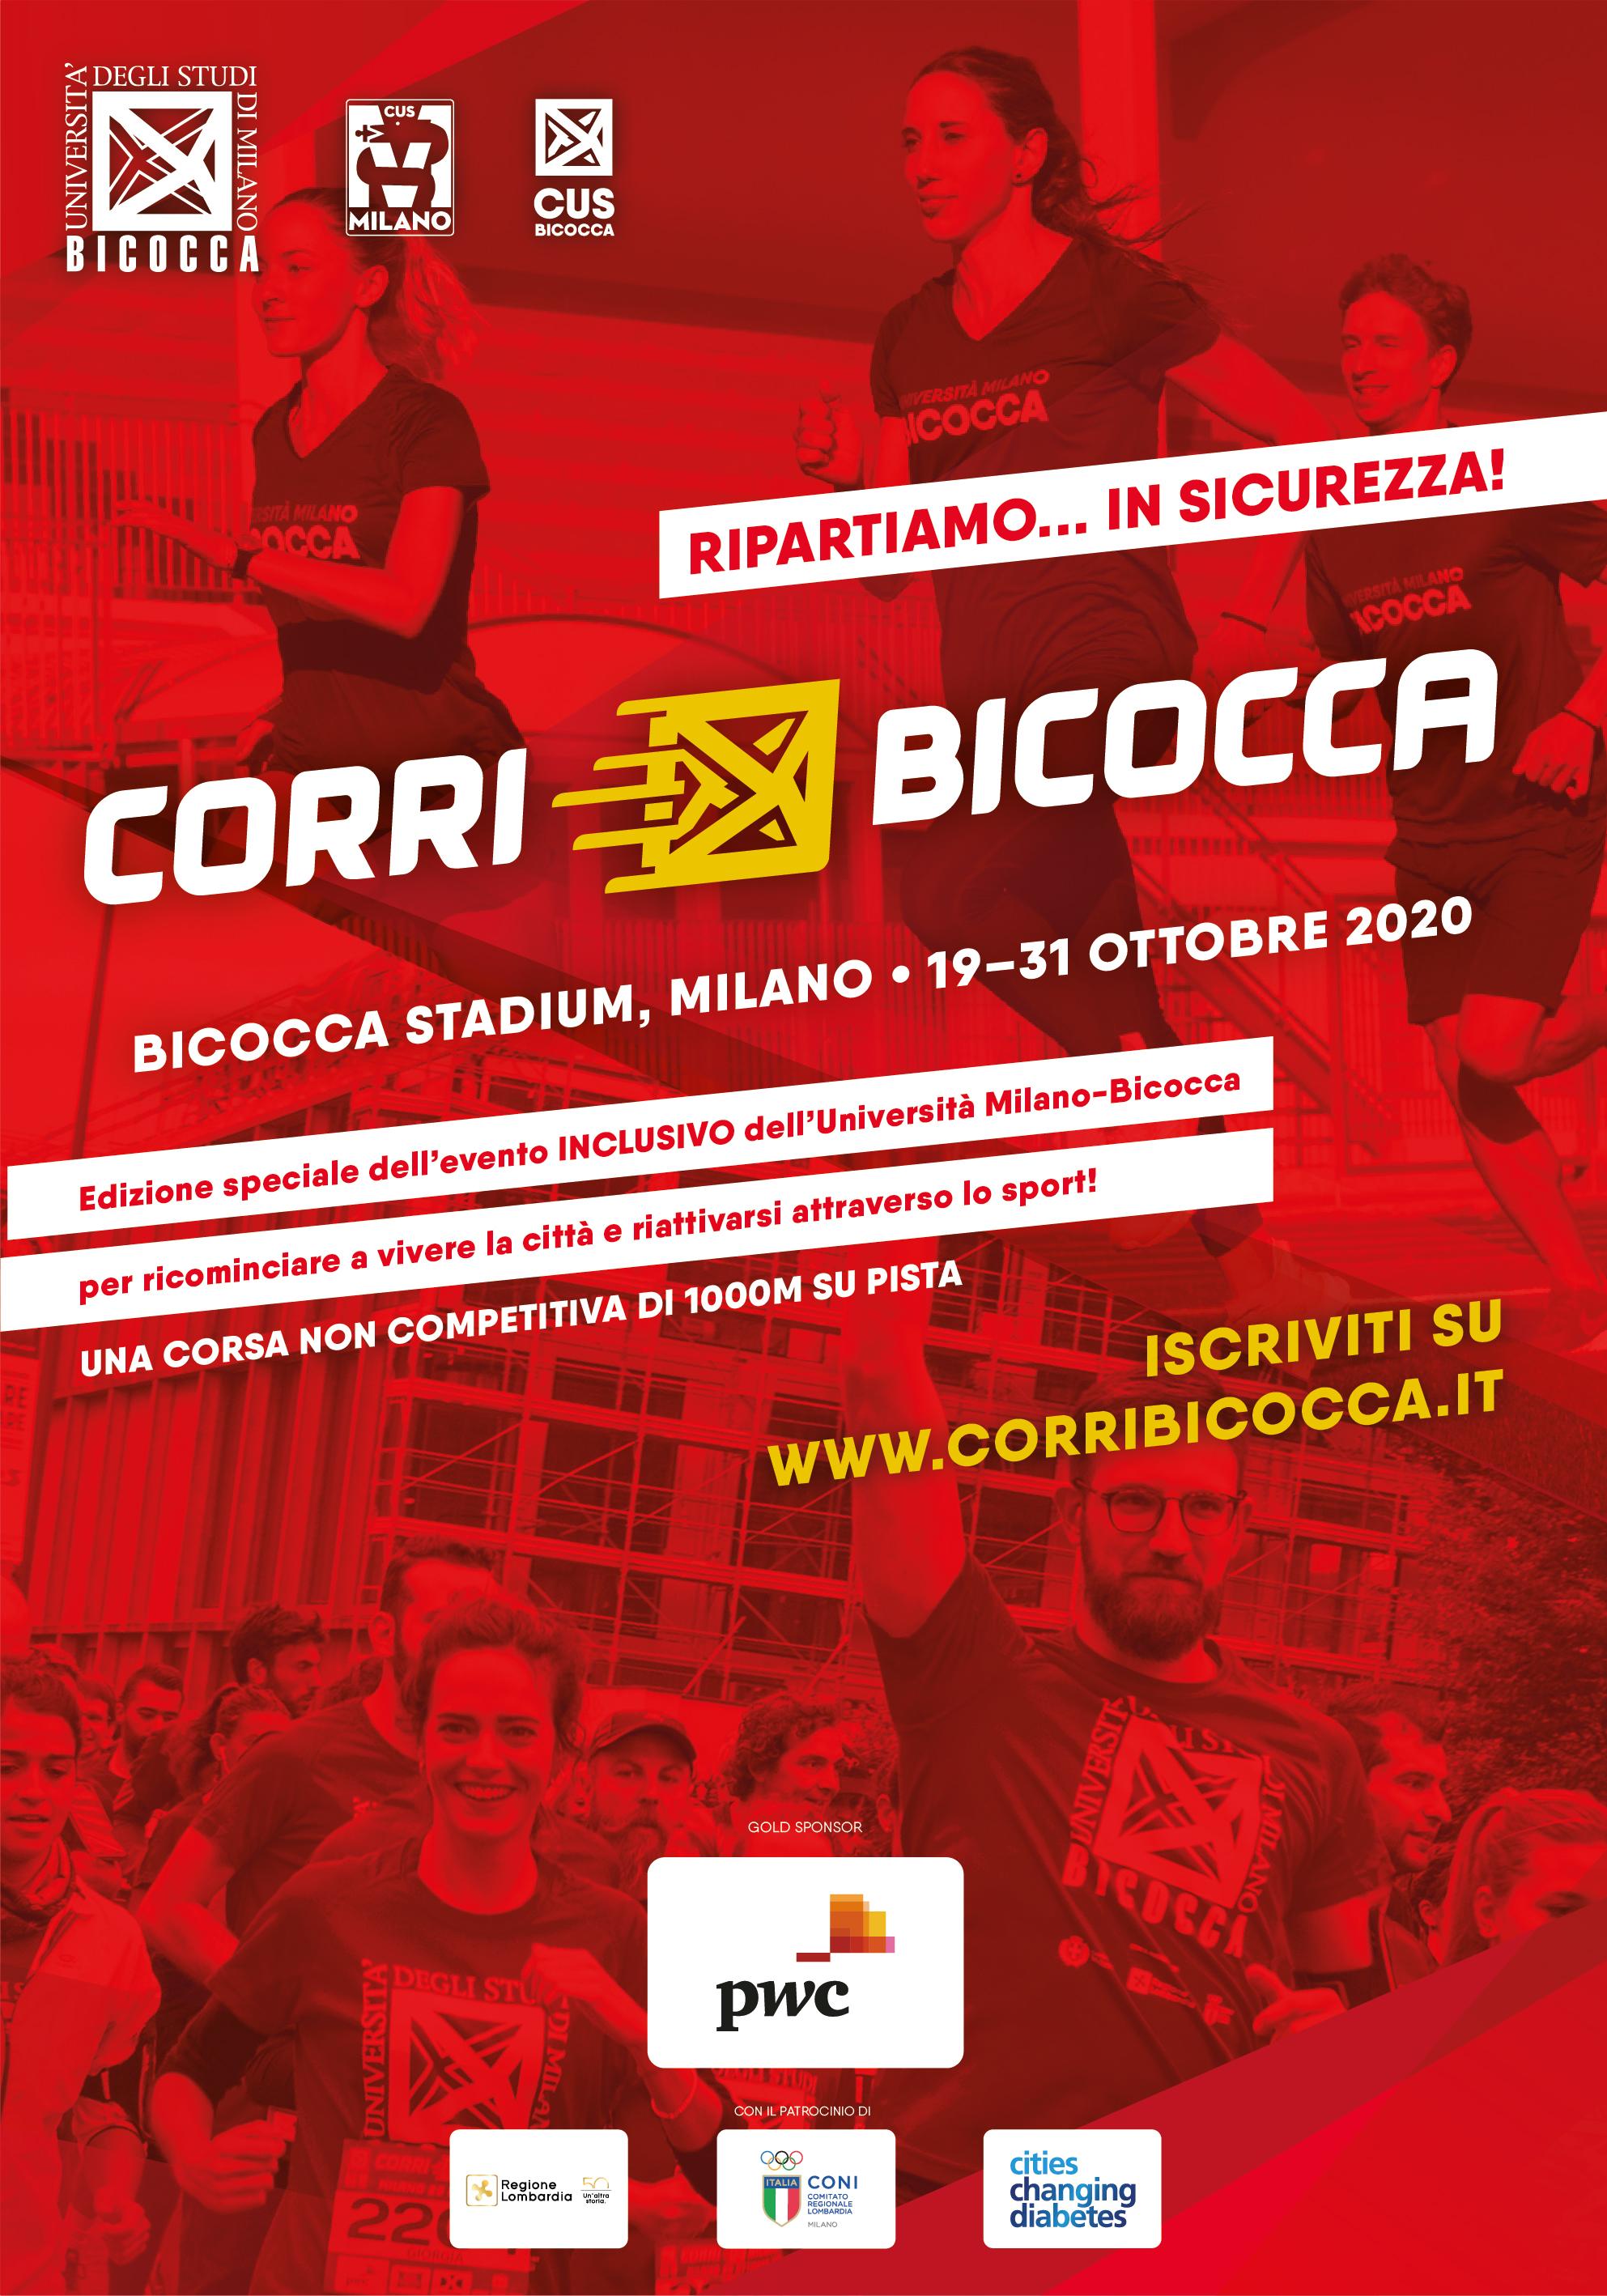 CorriBicocca 2020 • special edition